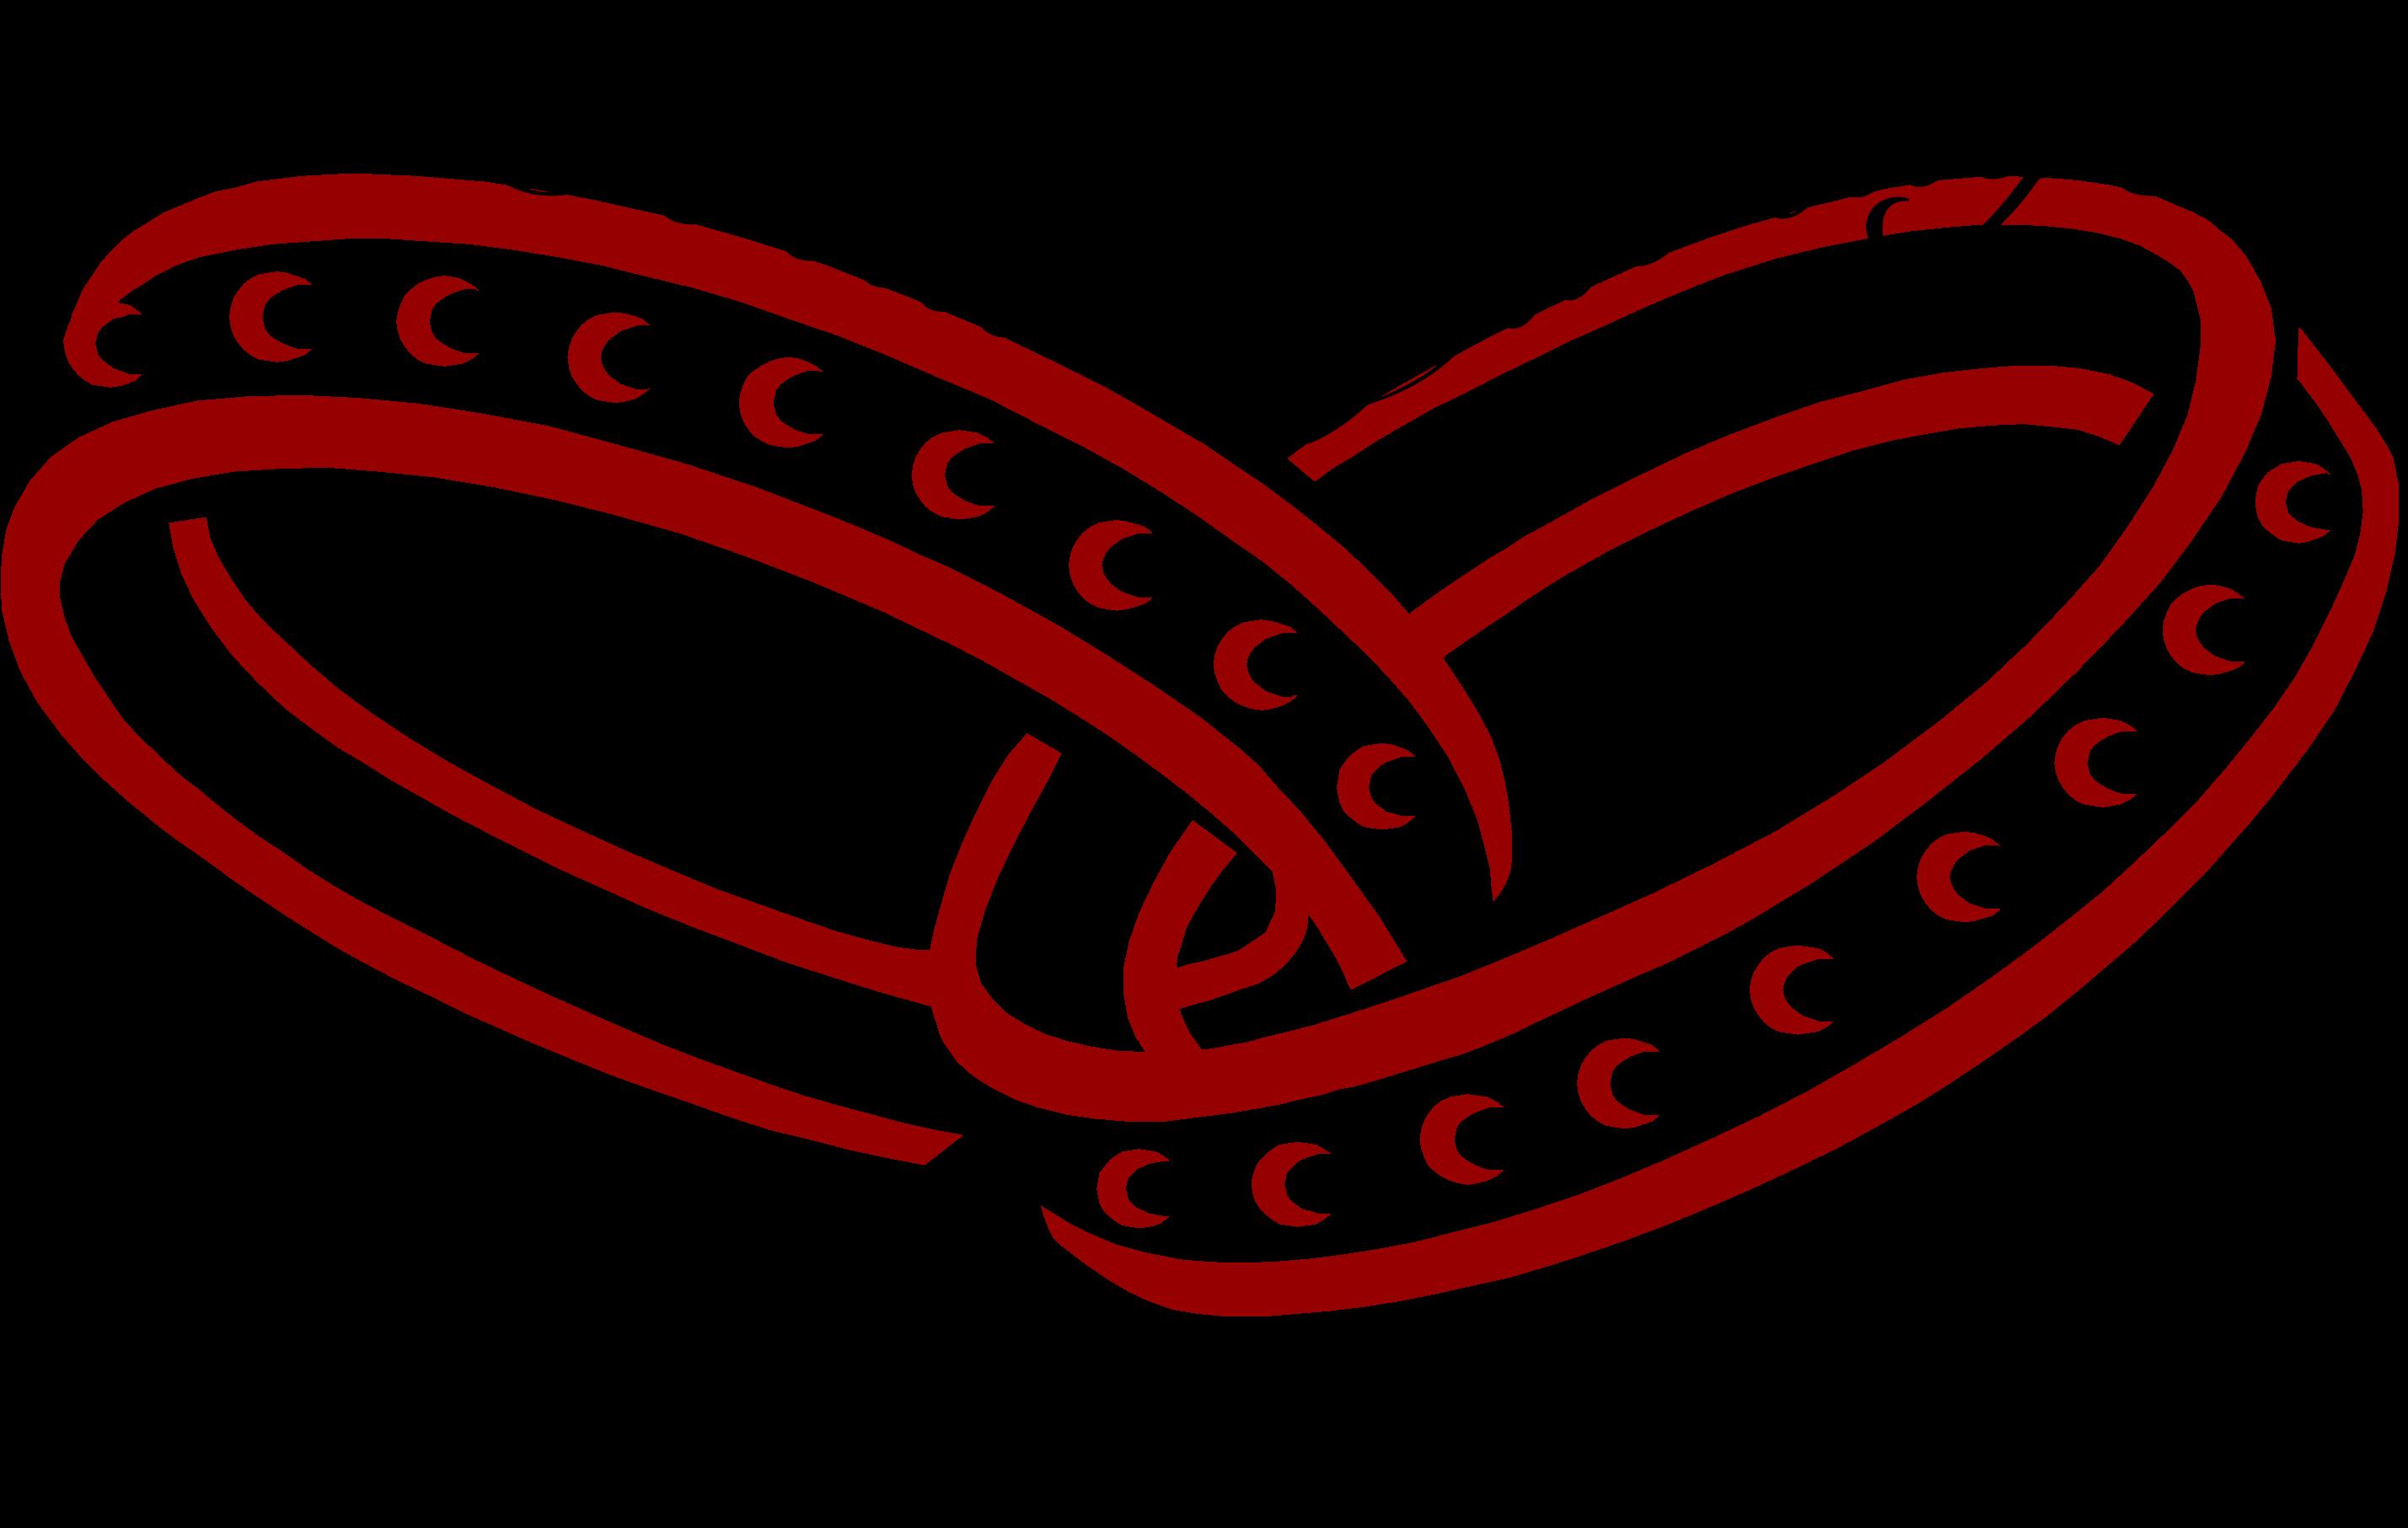 Логотипы на свадьбу картинки